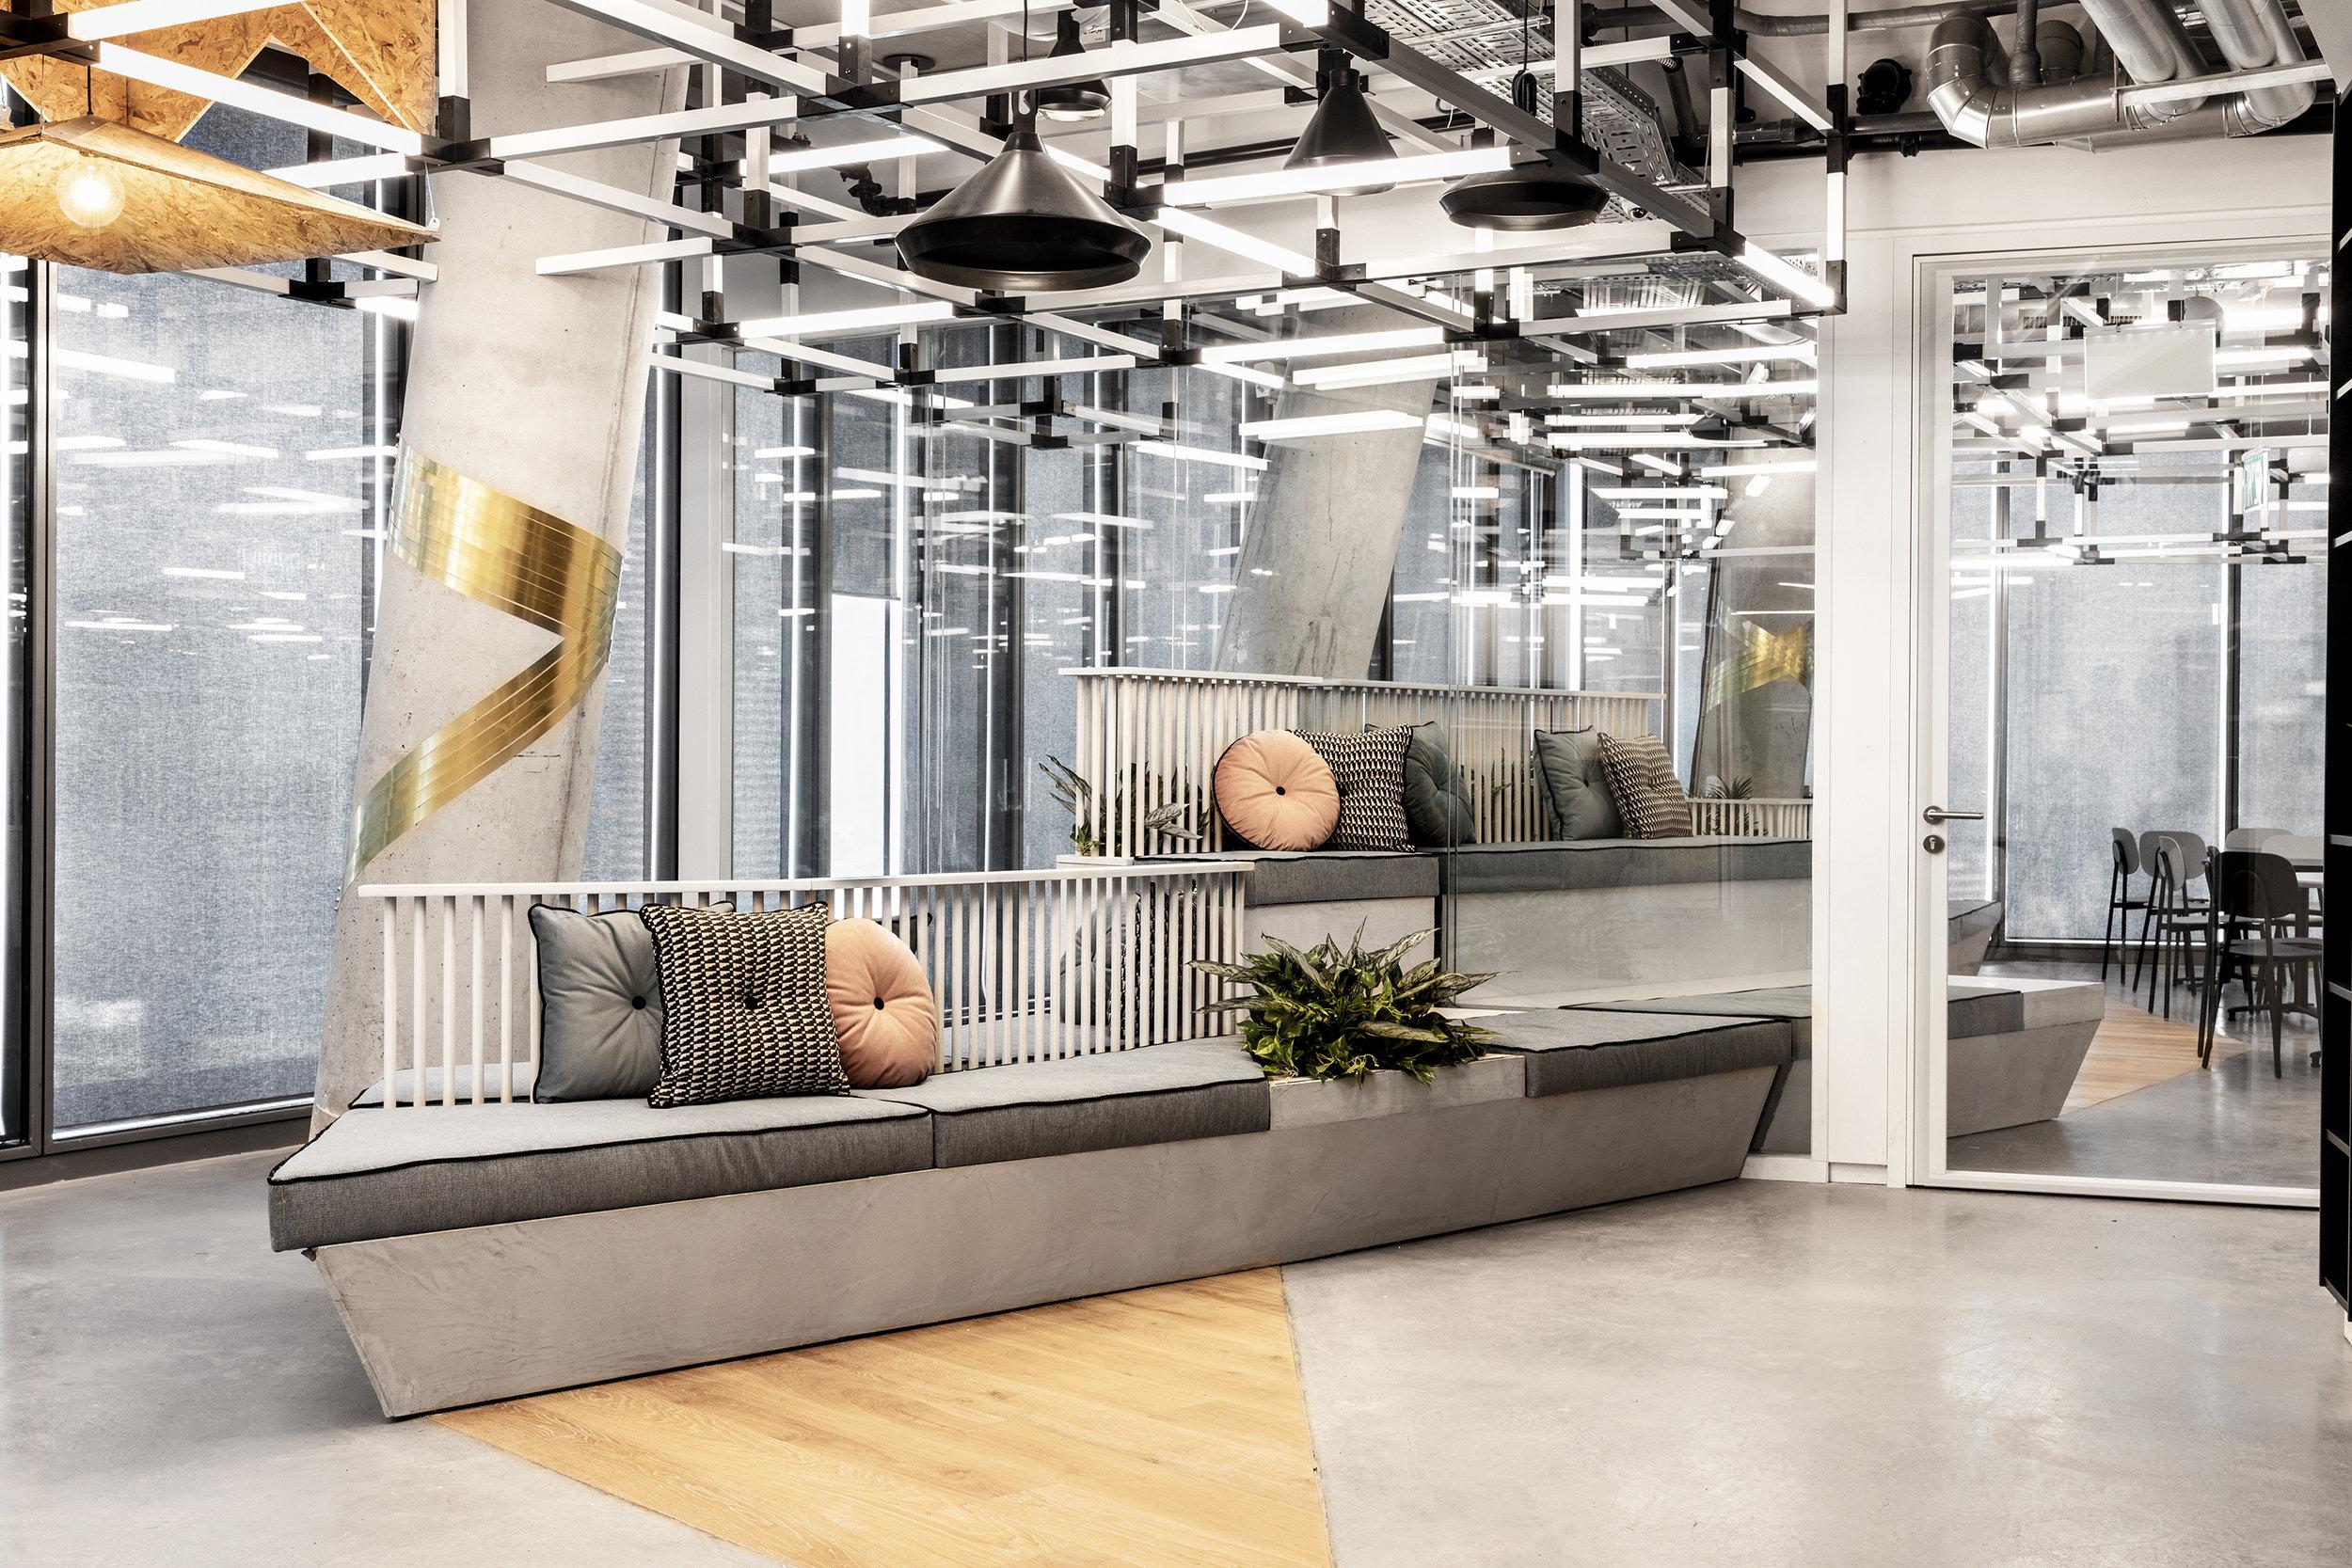 רואי דוד אדריכלות - אדריכל - נטורל אינטליג'נס - ROY DAVID - ARCHITECTURE - ARCHITECT - NI (28).jpg